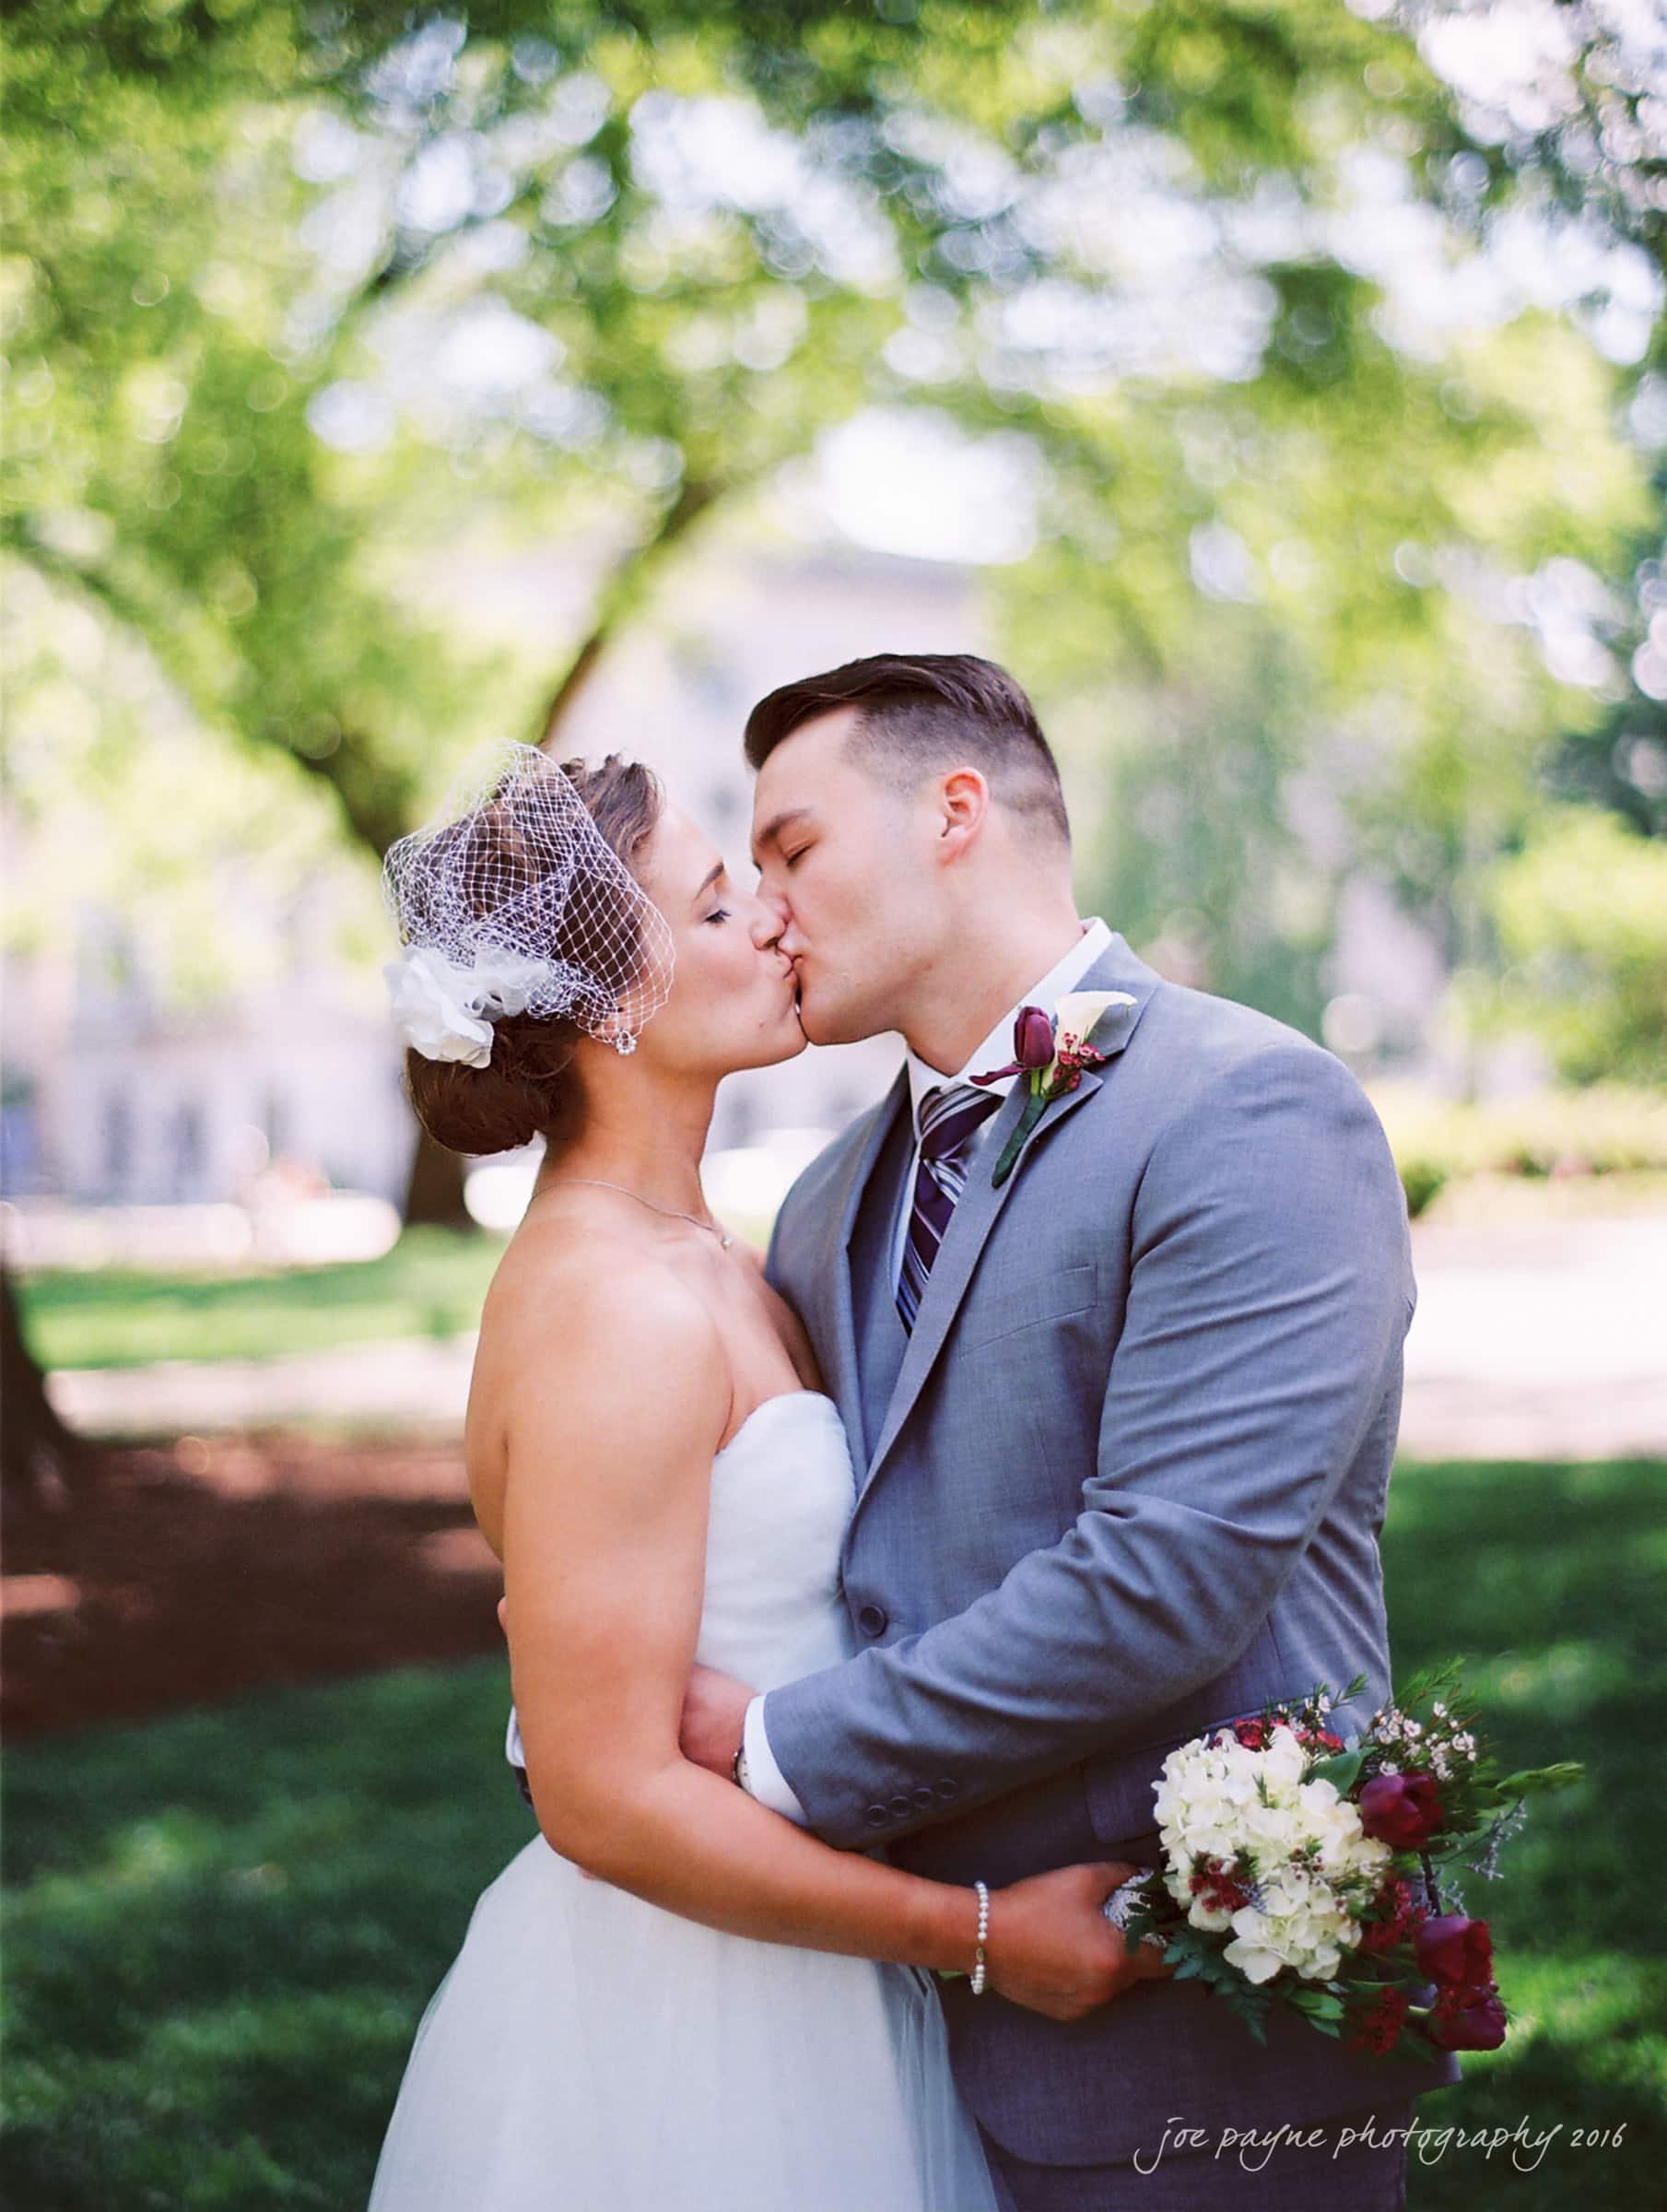 Downtown Raleigh Wedding Photographer - Alexandra & Trent -17